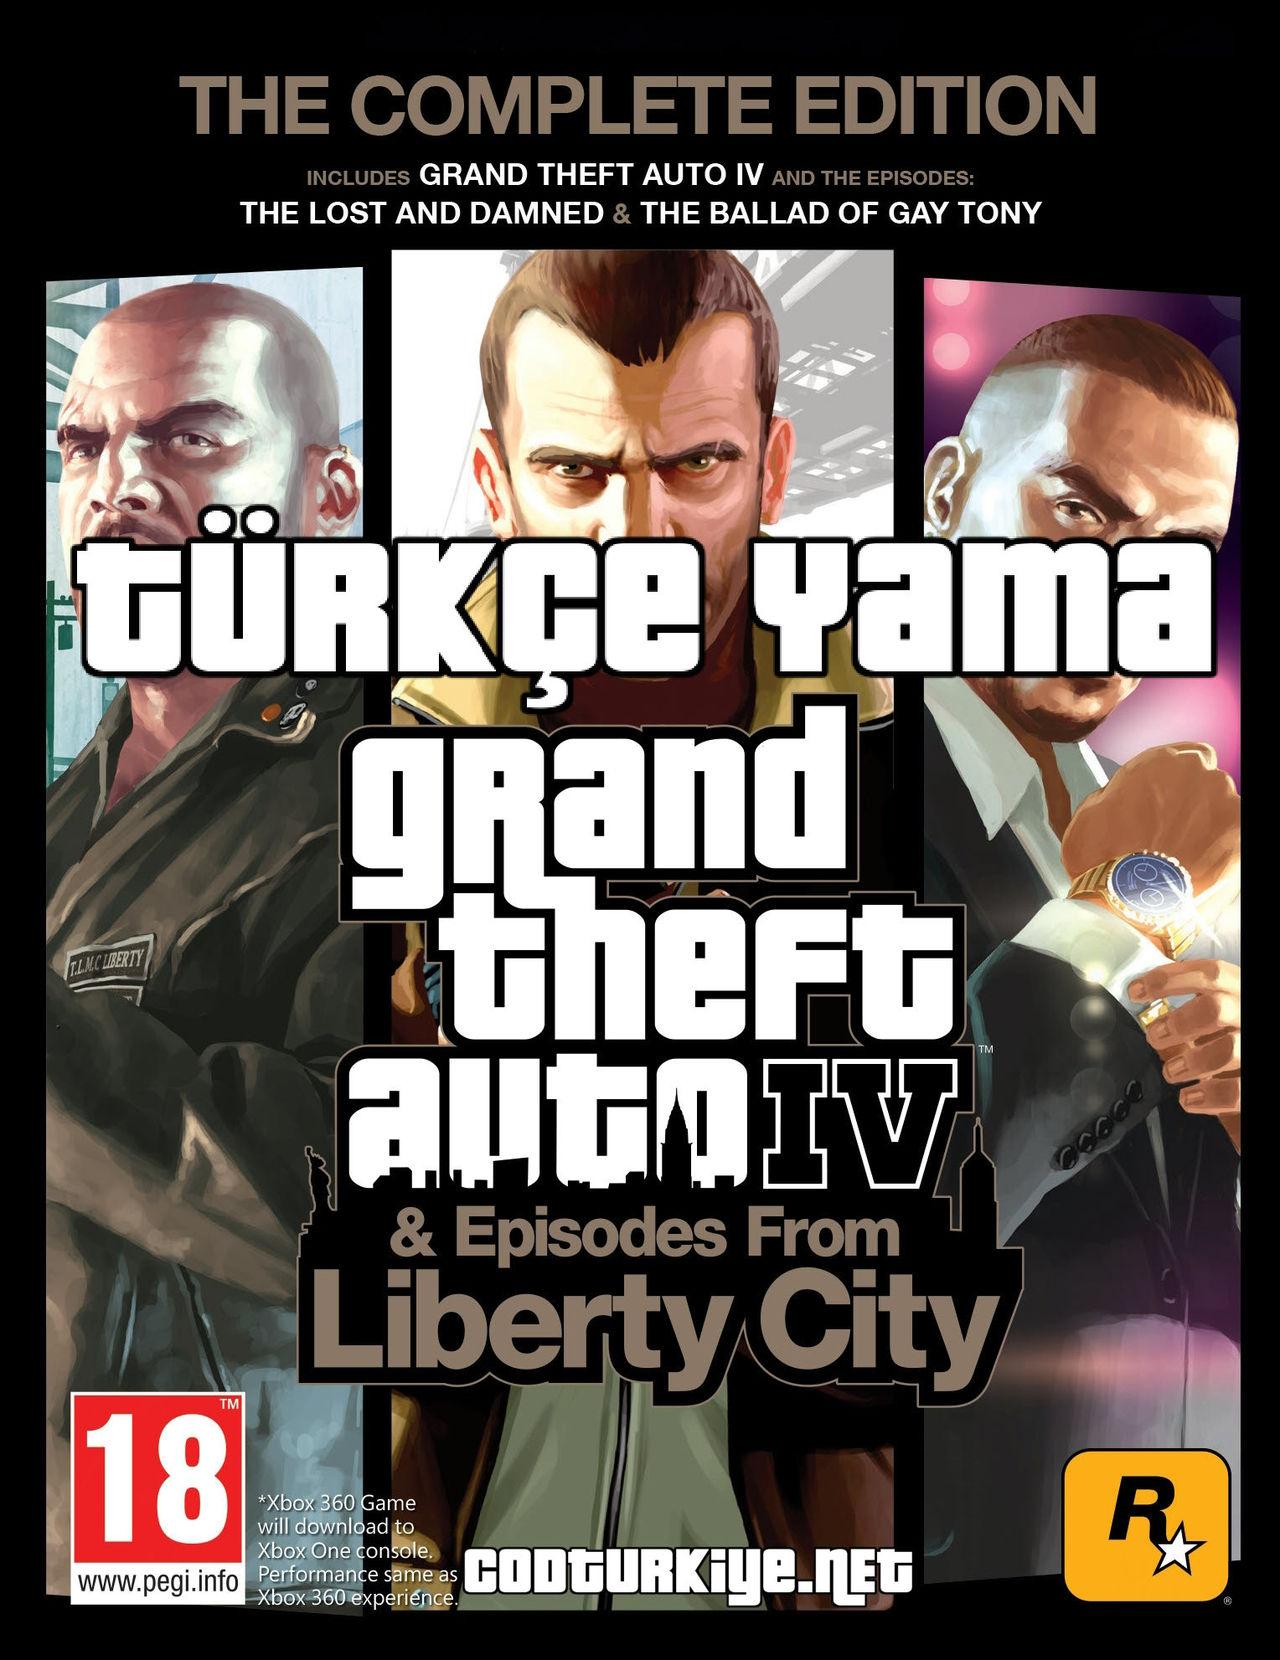 Grand Theft Auto IV: The Complete Edition Türkçe Yama